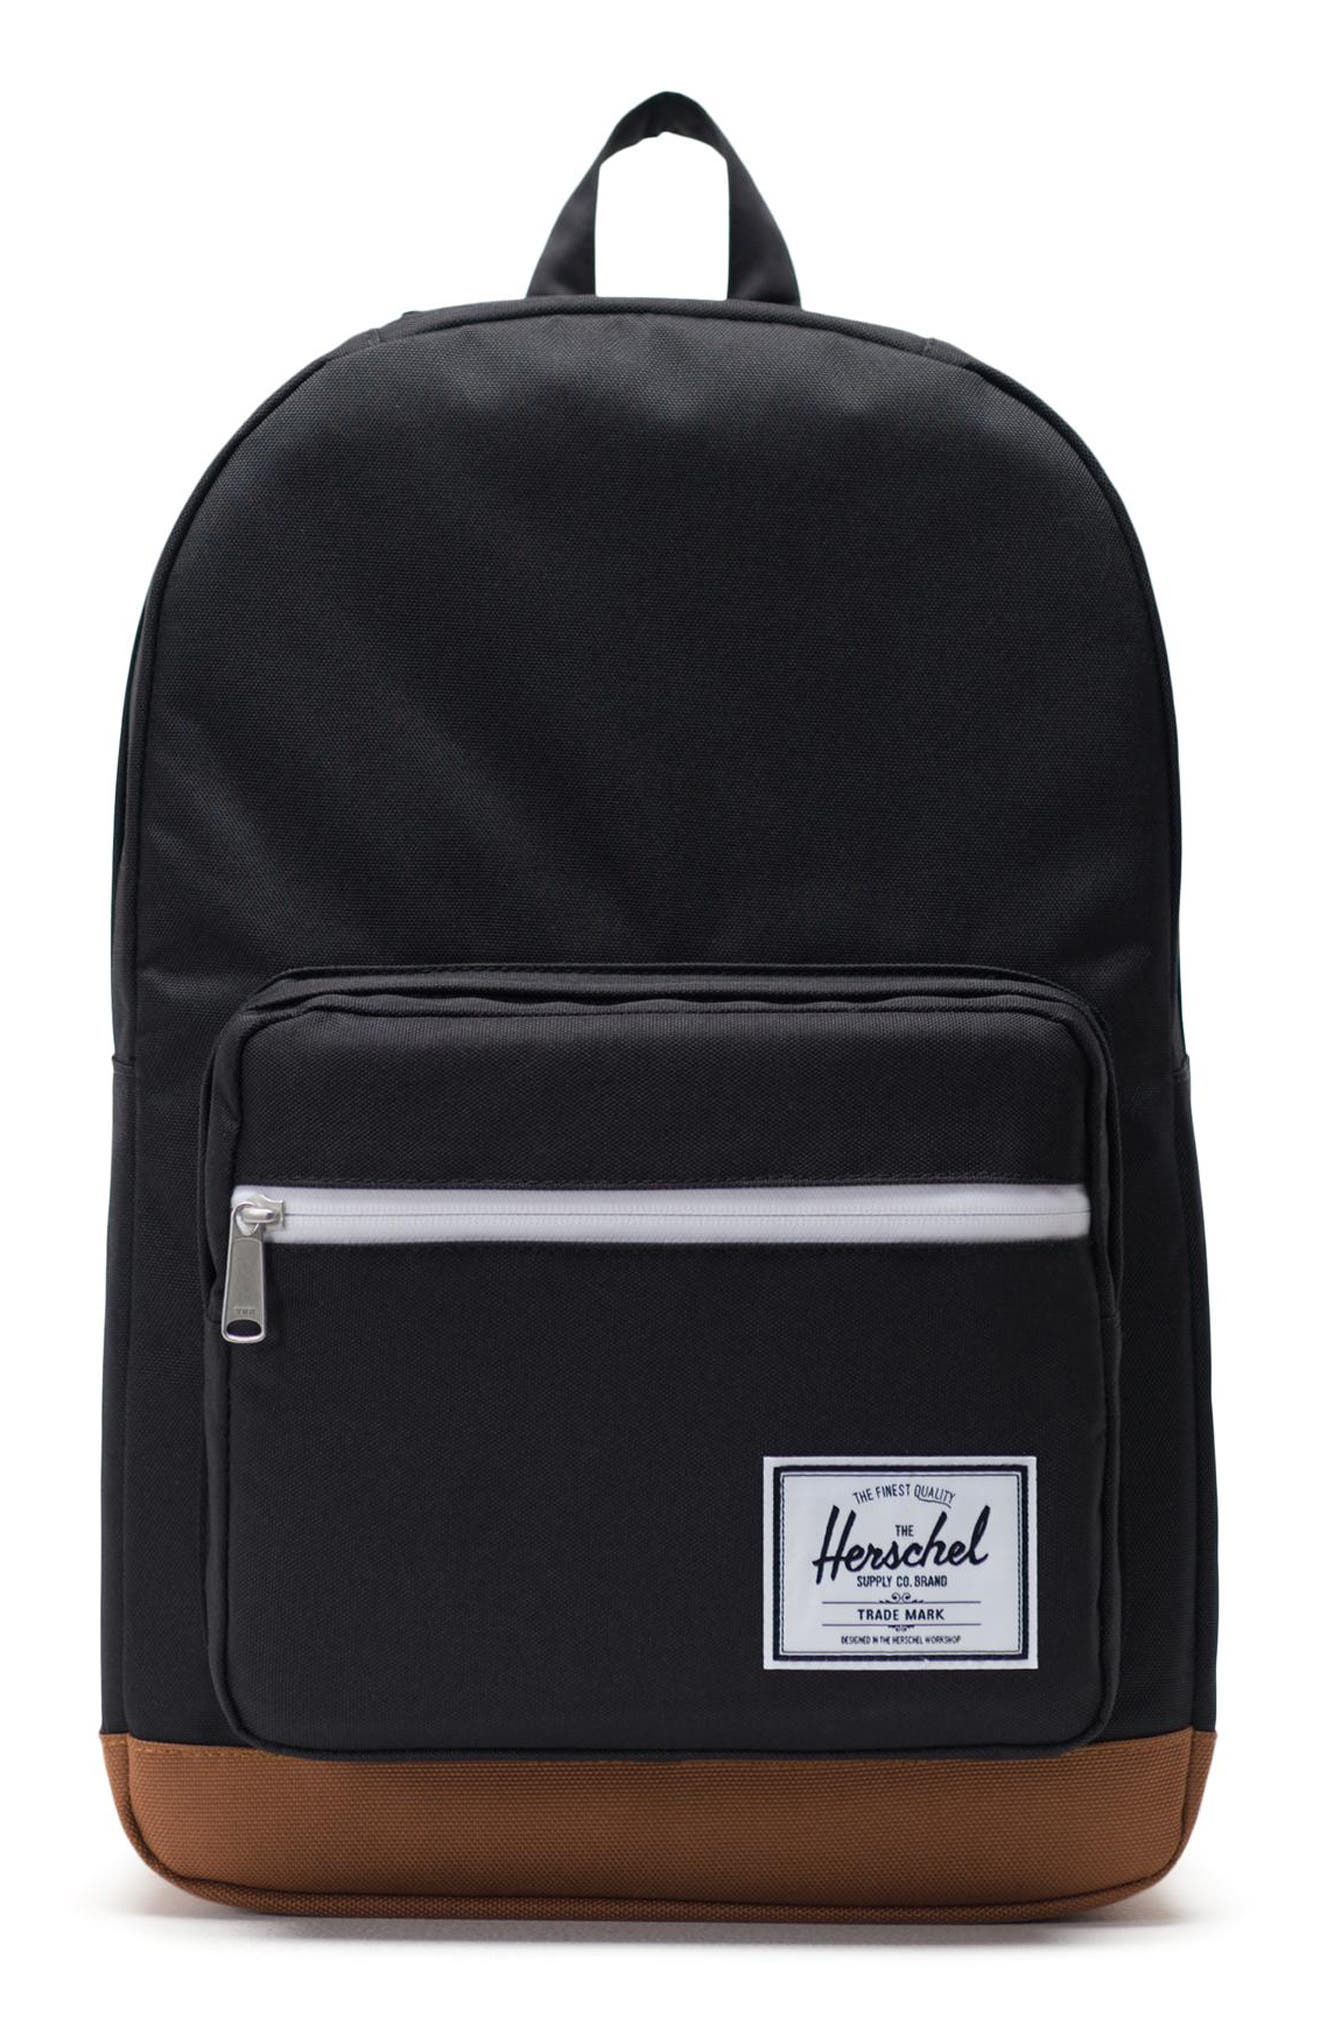 HERSCHEL SUPPLY CO., Pop Quiz Backpack, Main thumbnail 1, color, BLACK/ SADDLE BROWN